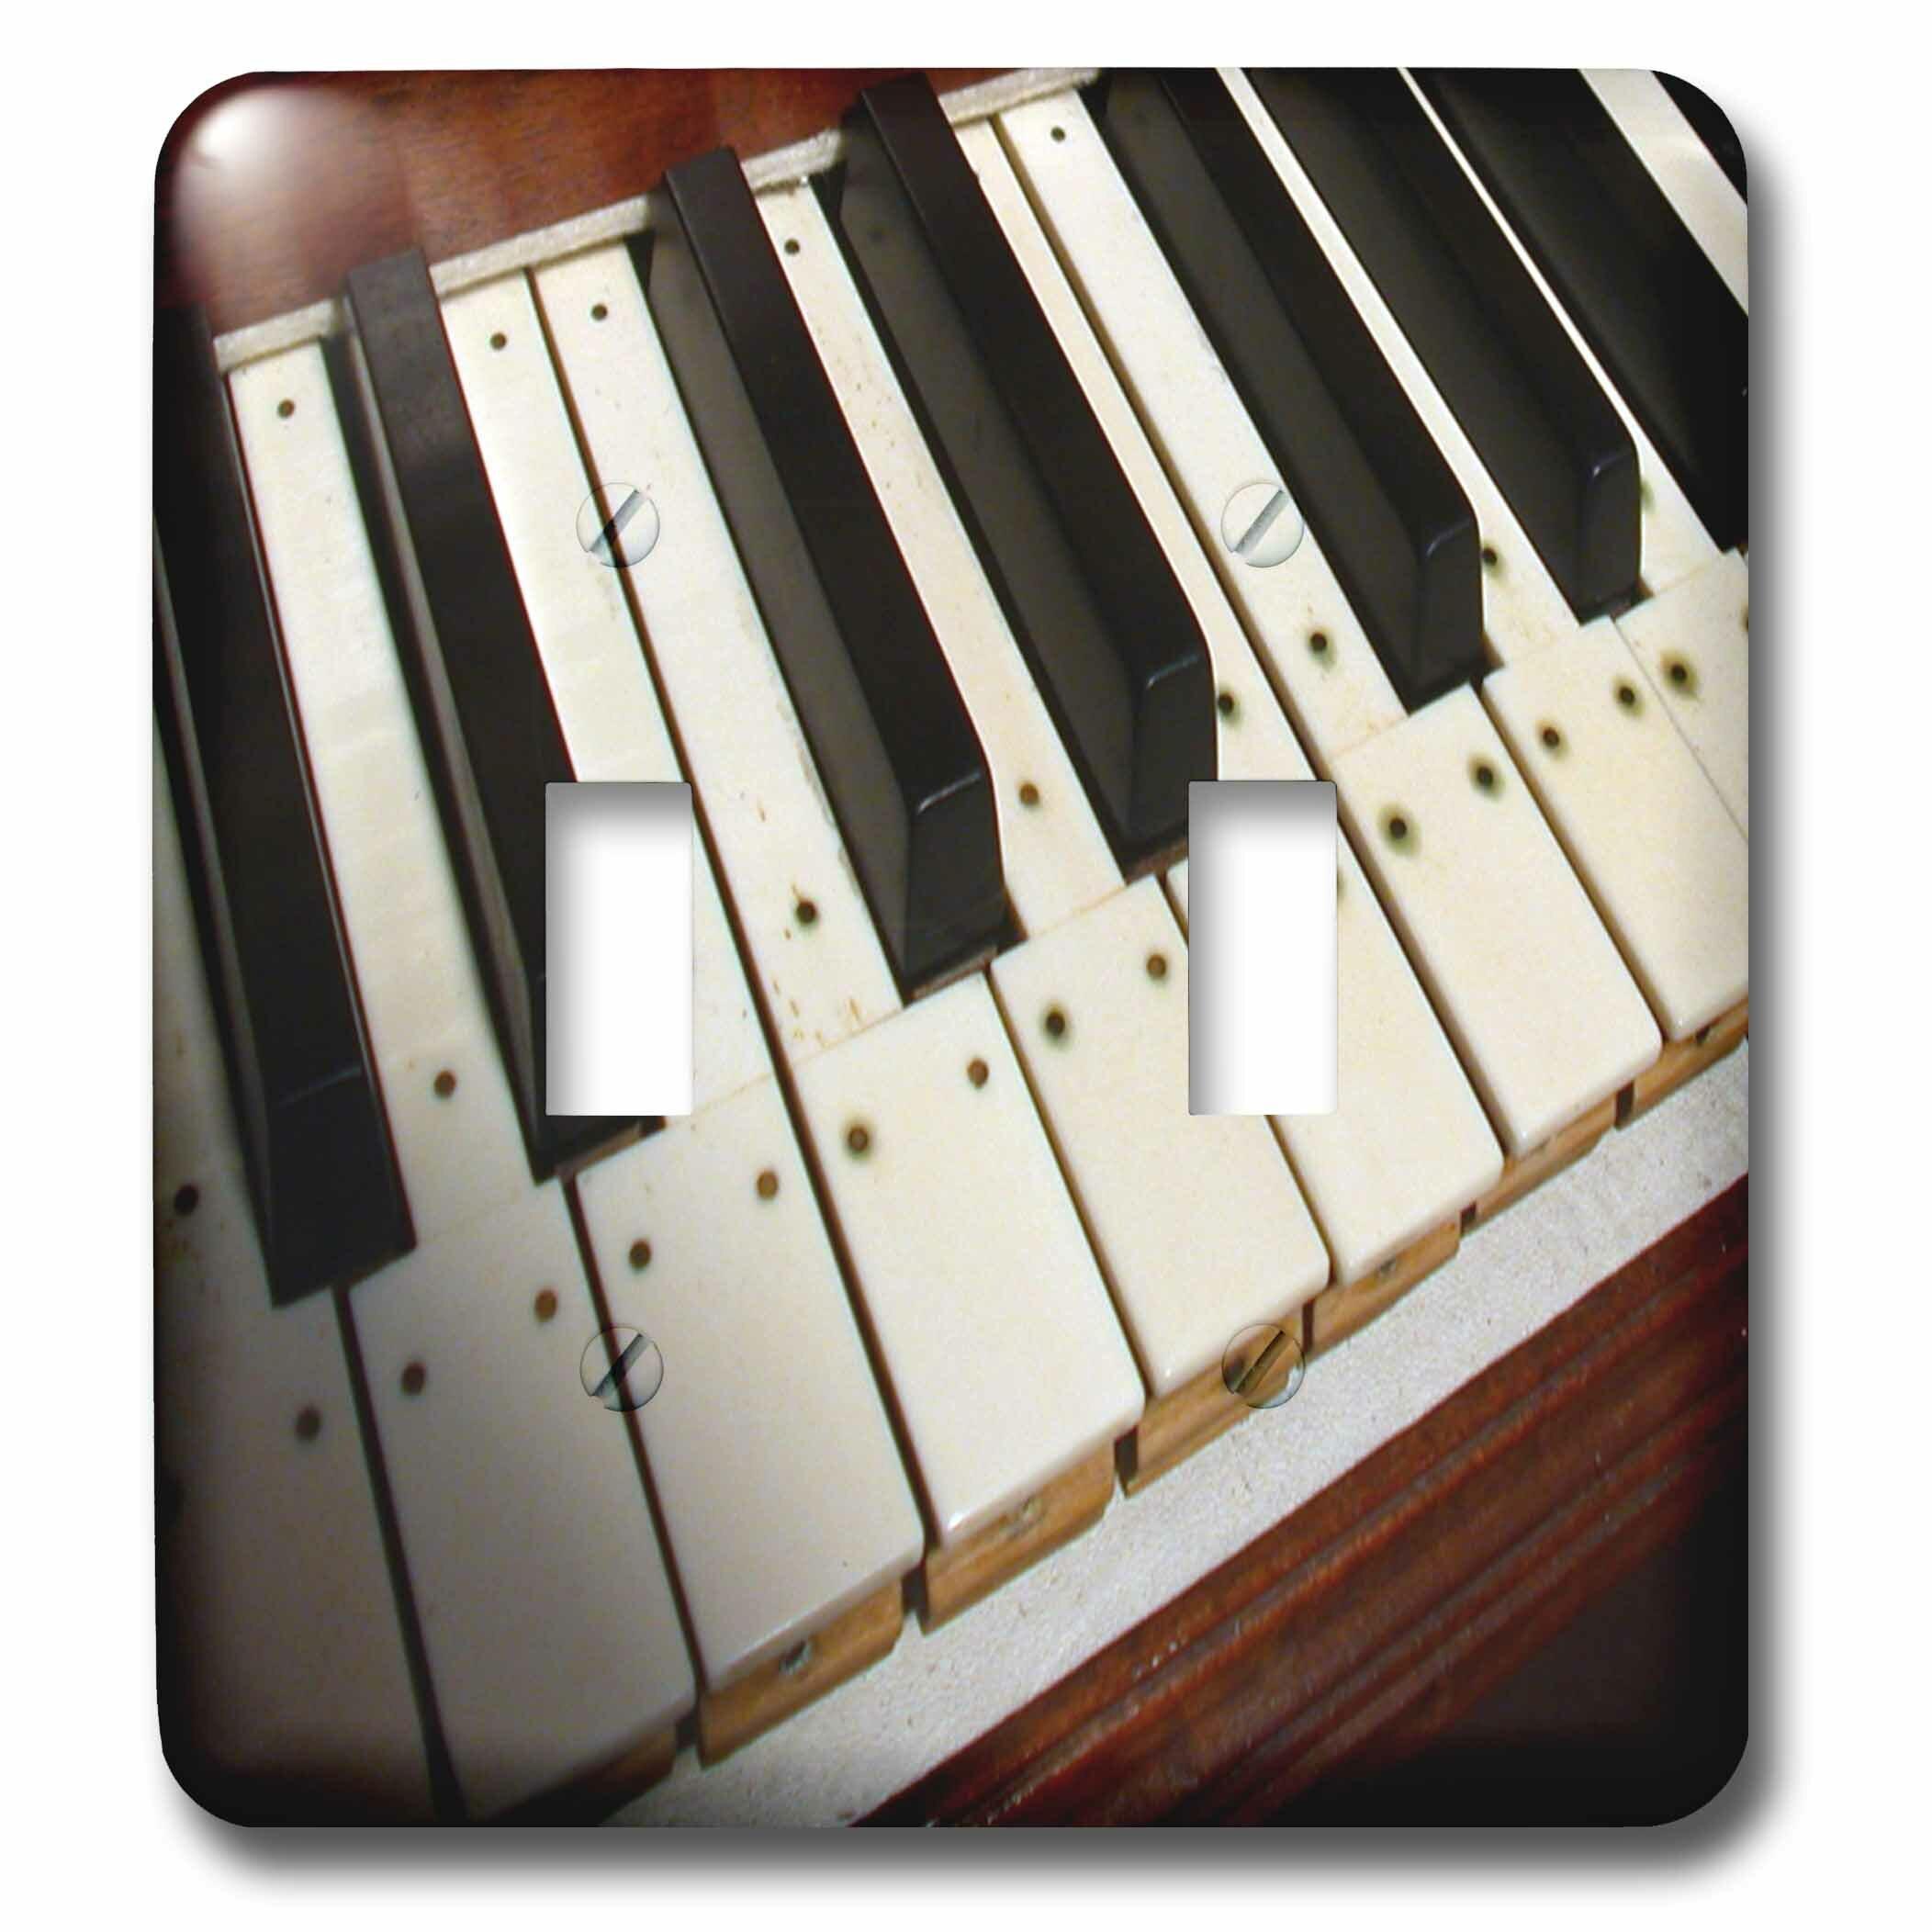 3drose Piano Keyboard 2 Gang Toggle Light Switch Wall Plate Wayfair